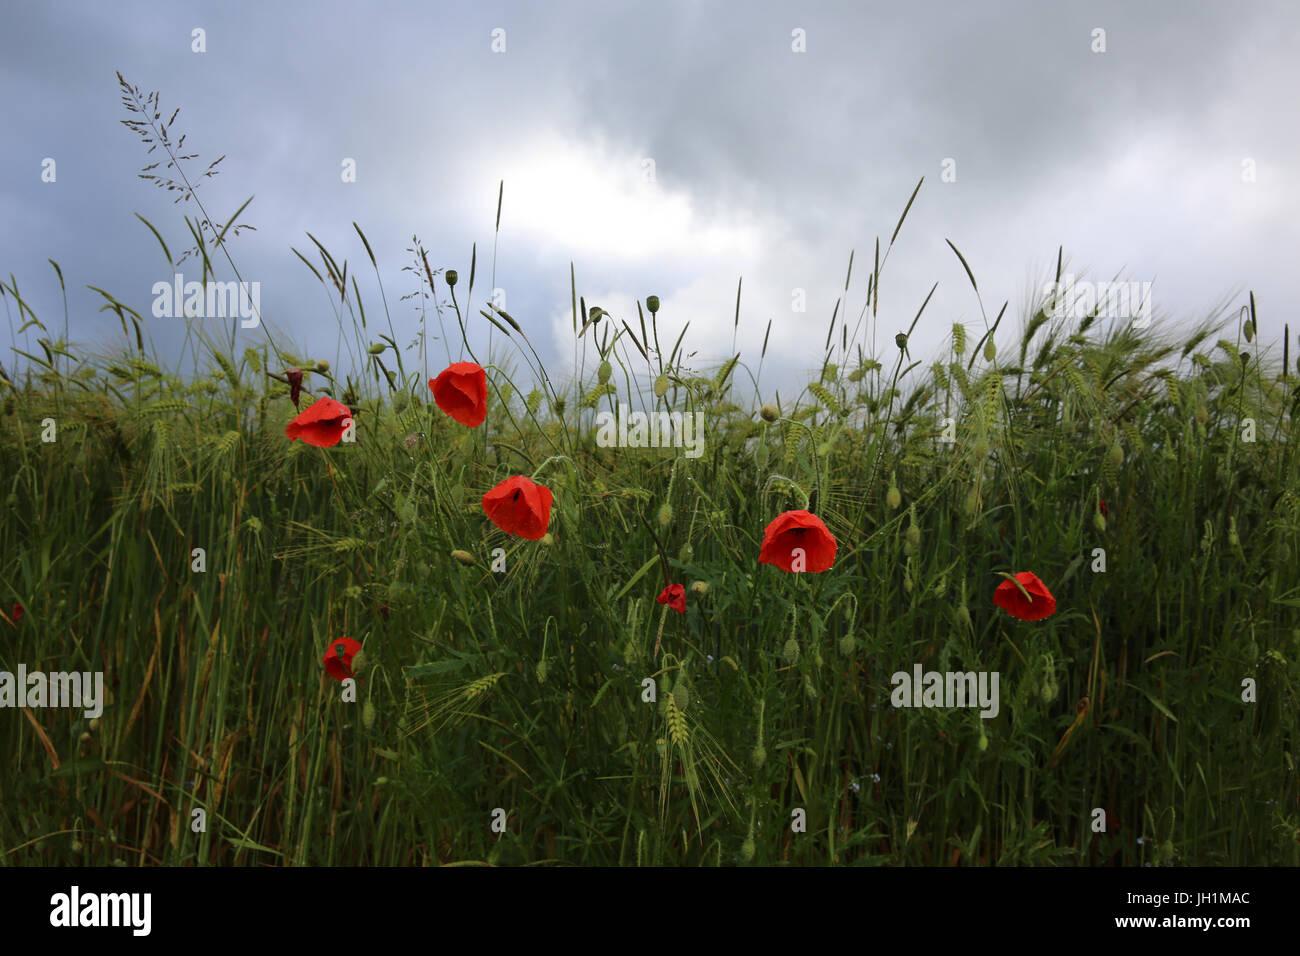 Poppies alongside a wheat field. France. - Stock Image